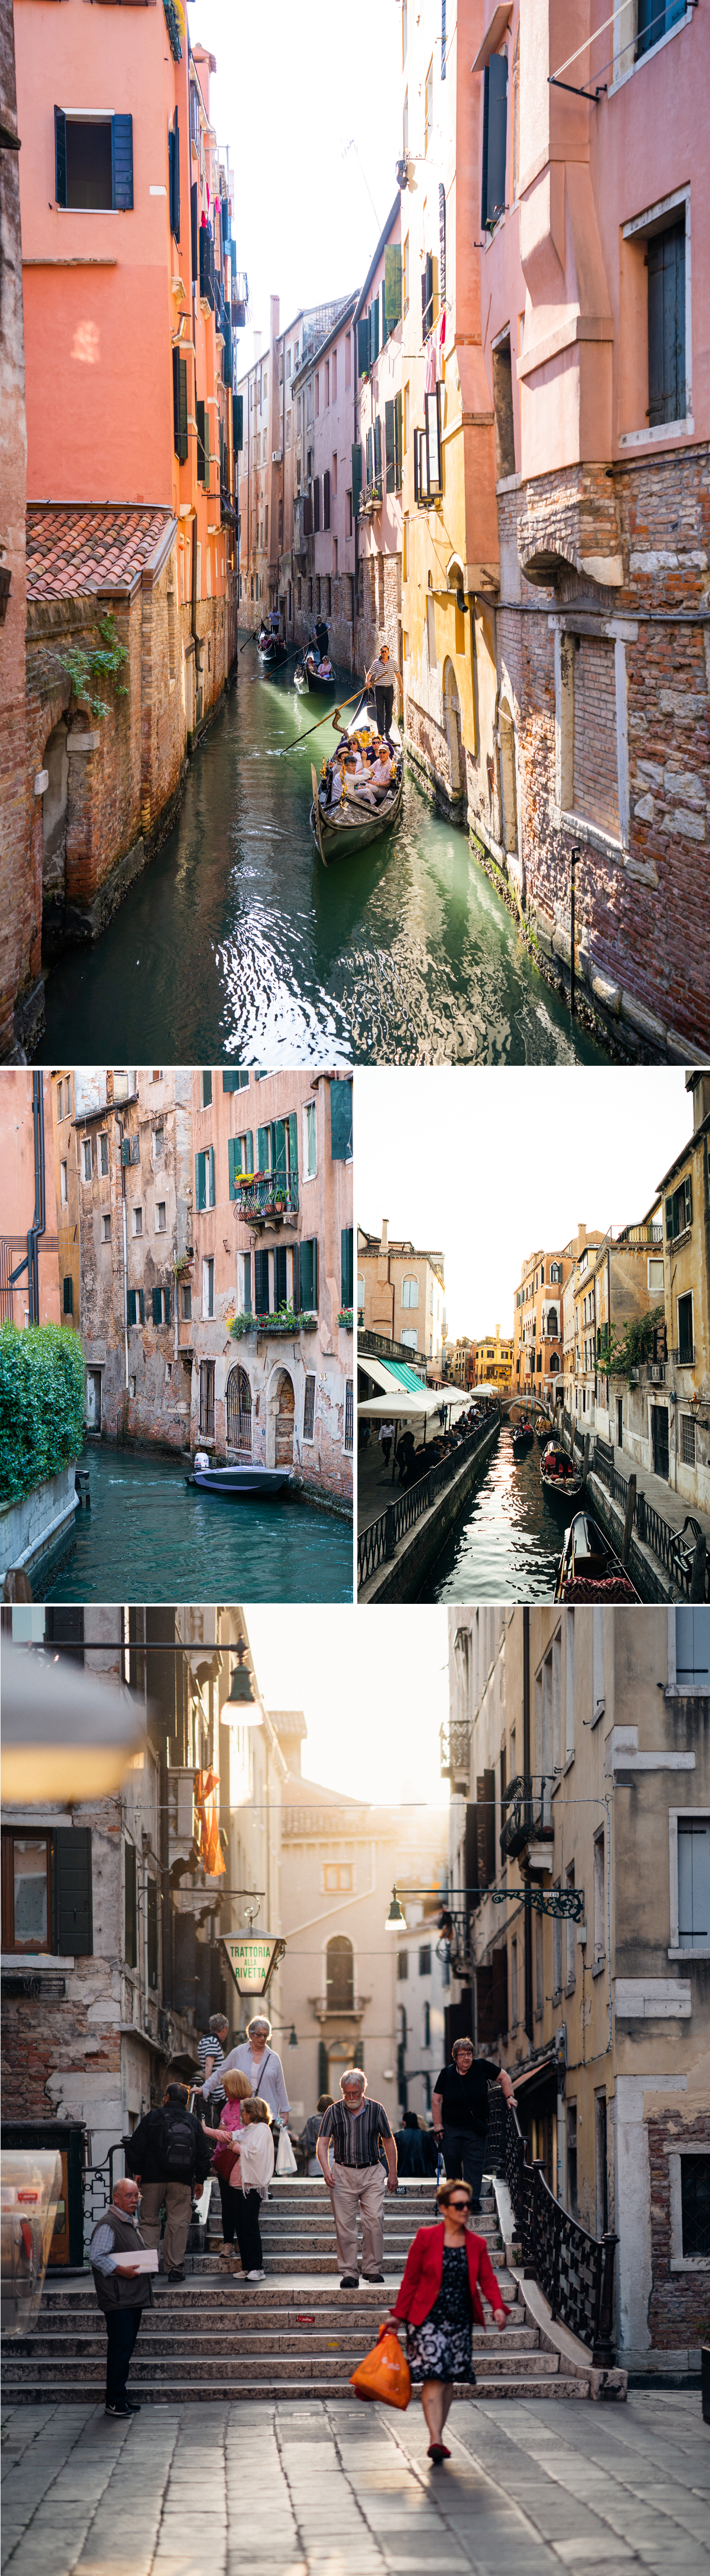 Venice - Canals.jpg